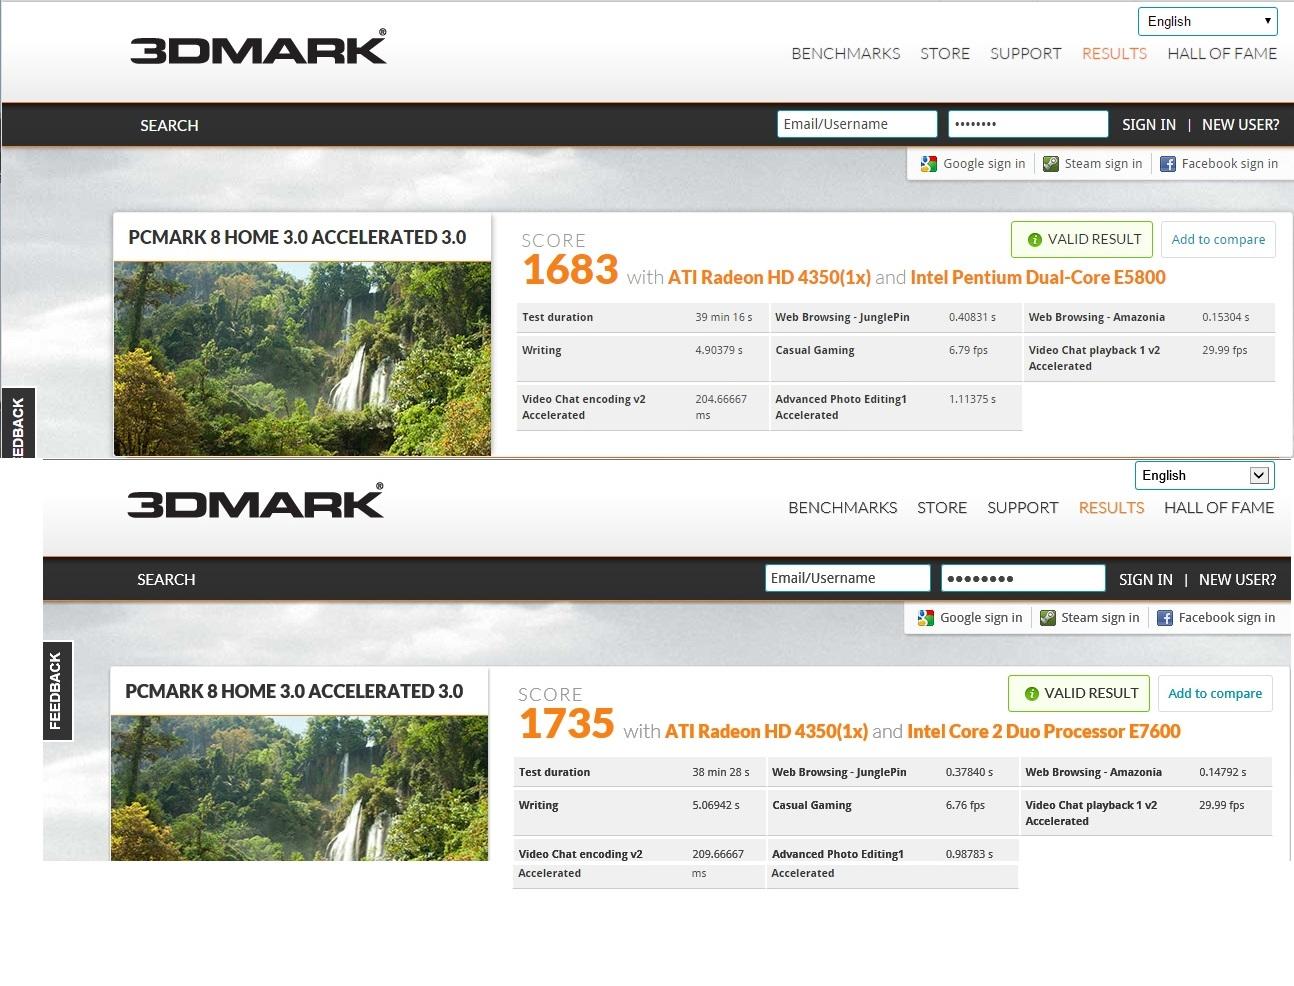 Solved Upgrading From E5200 To E5800 E7600 E8500 And No Mb F Prosesor Pcmark Score